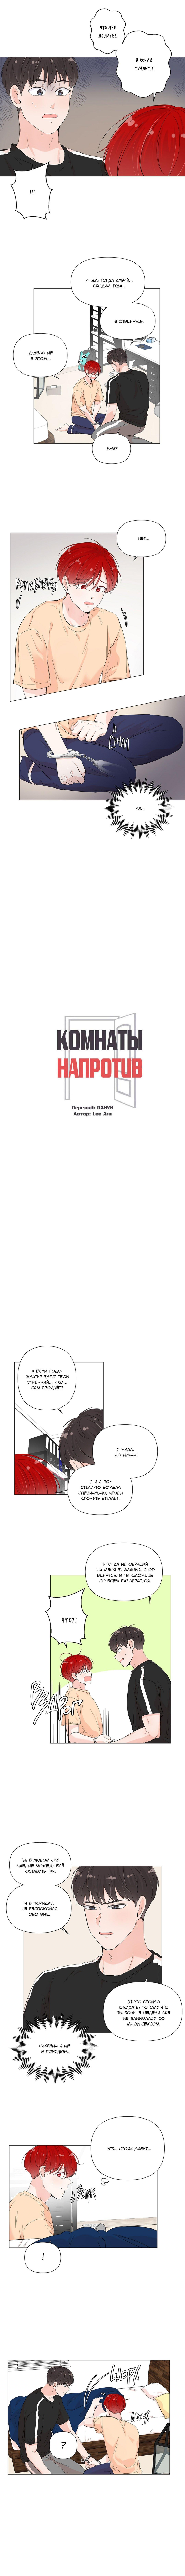 Манга Комнаты напротив - Глава 35 Страница 1